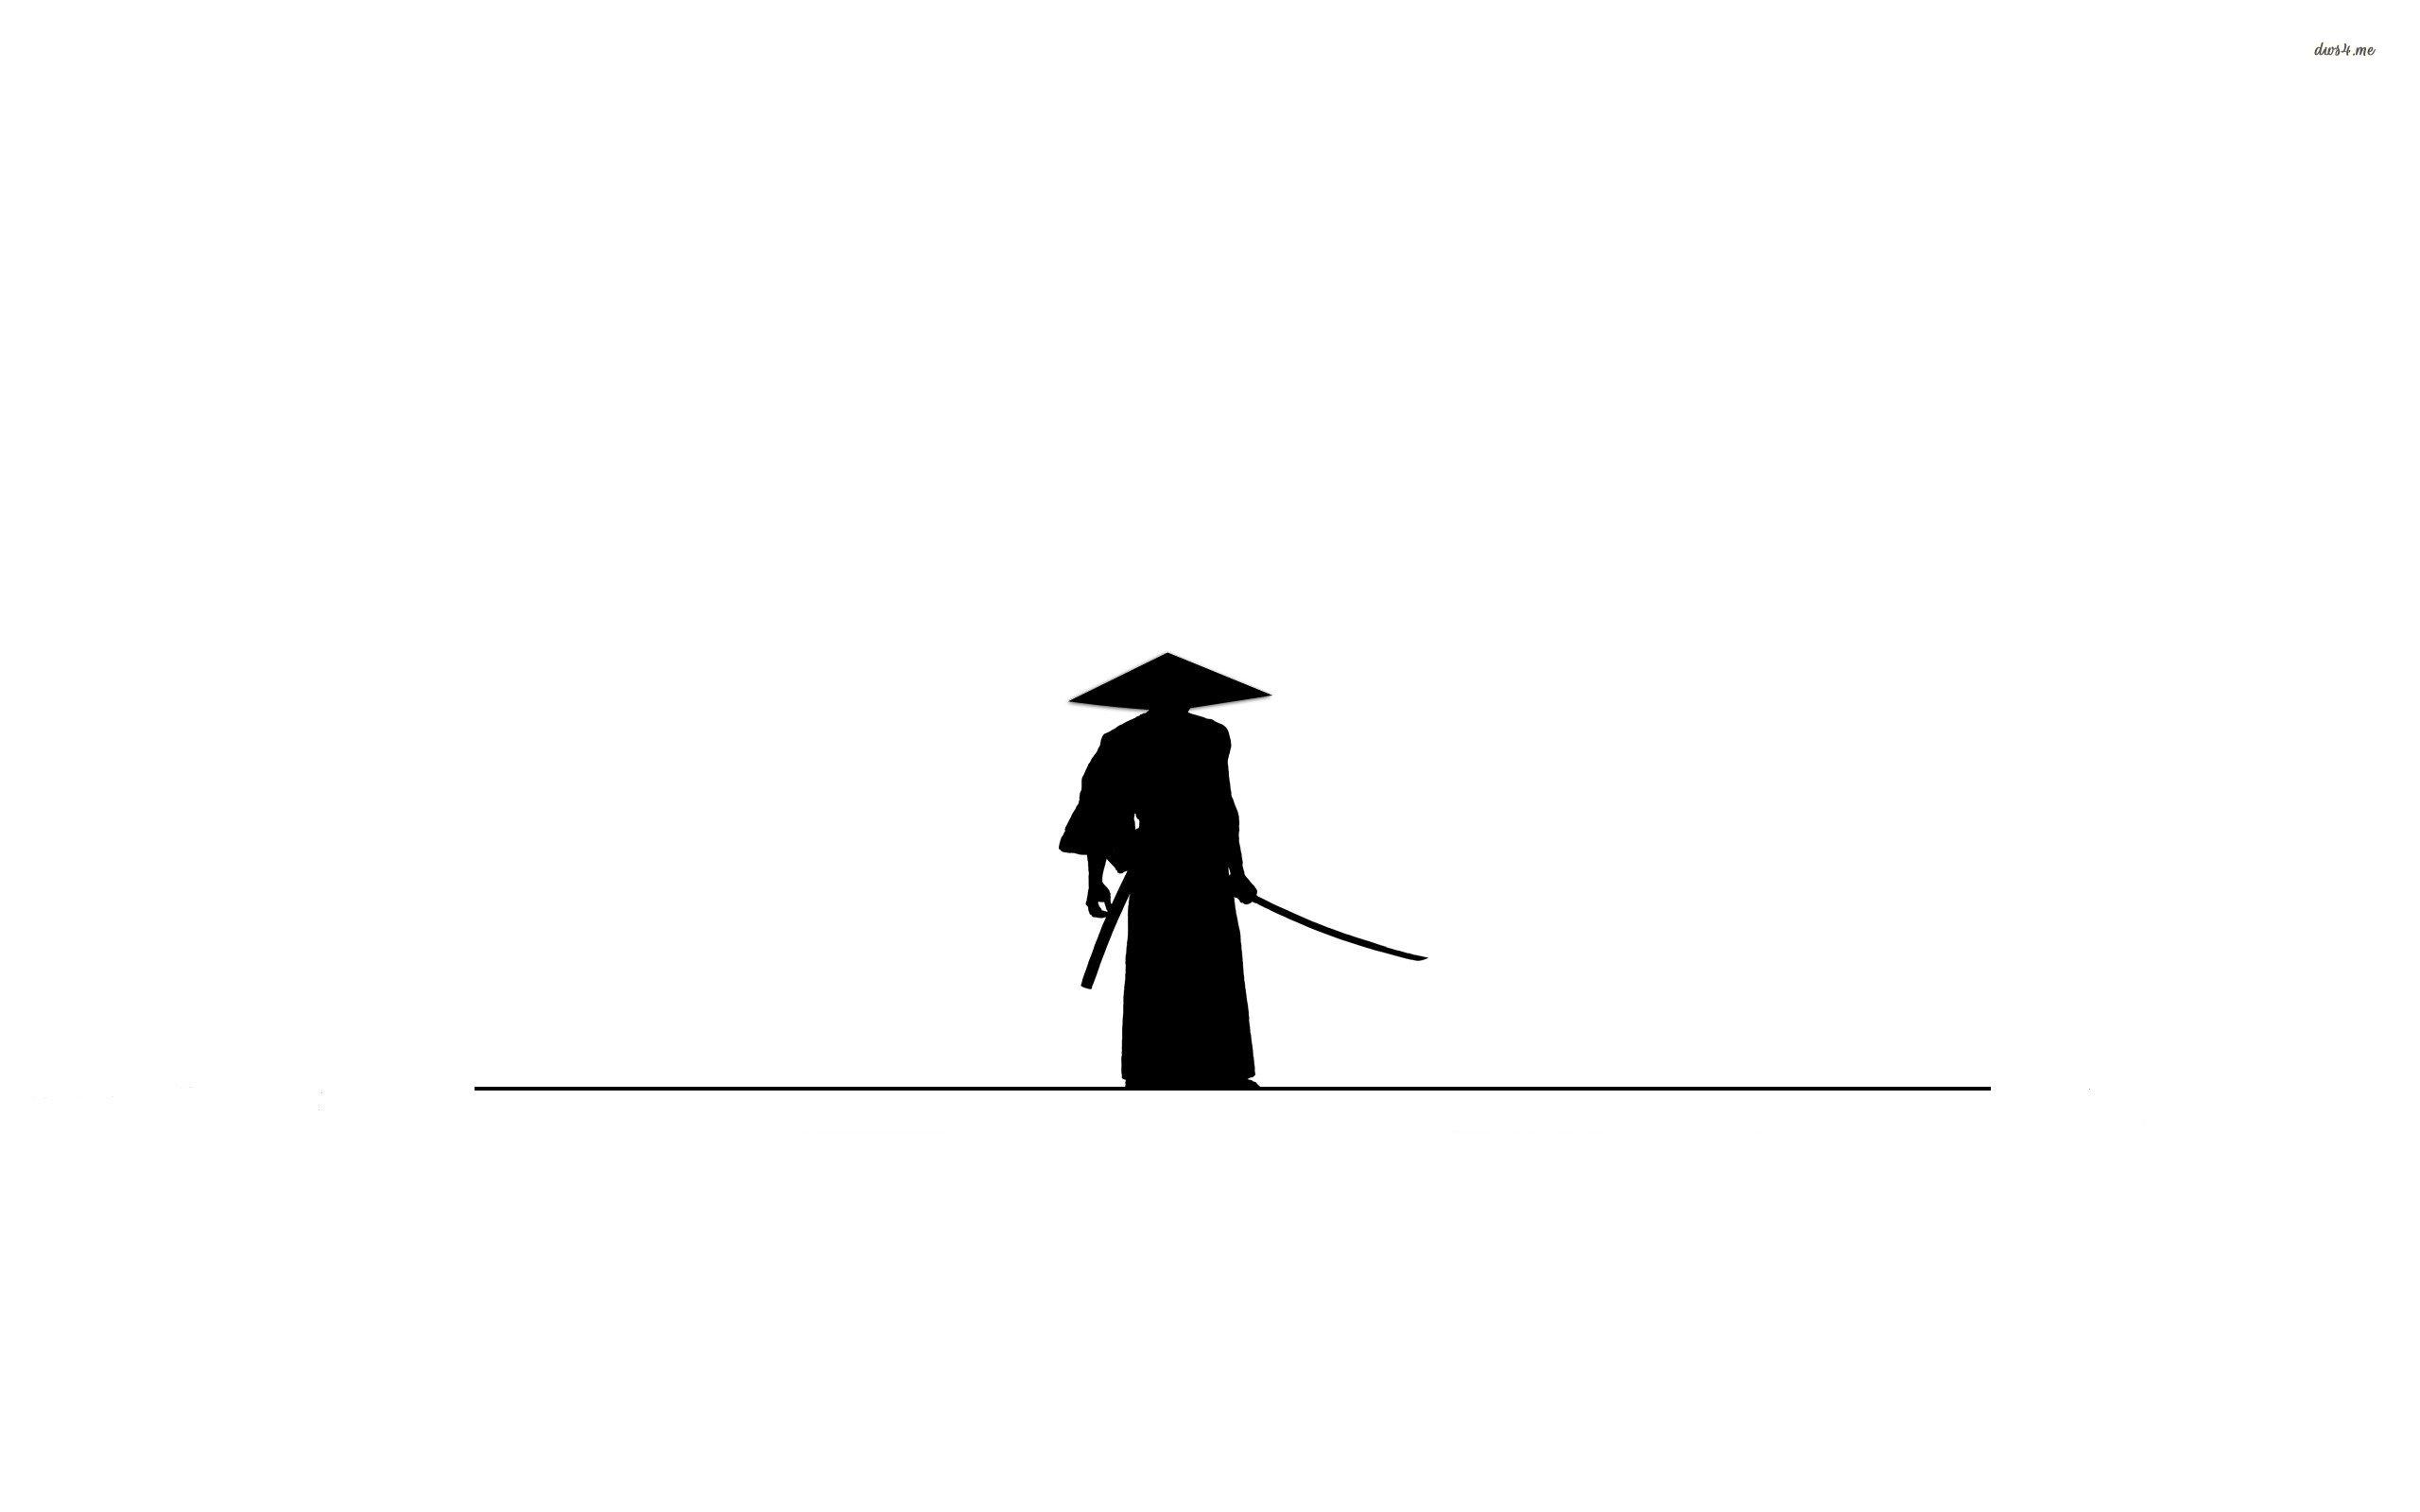 2560x1600 Samurai Silhouette 919202